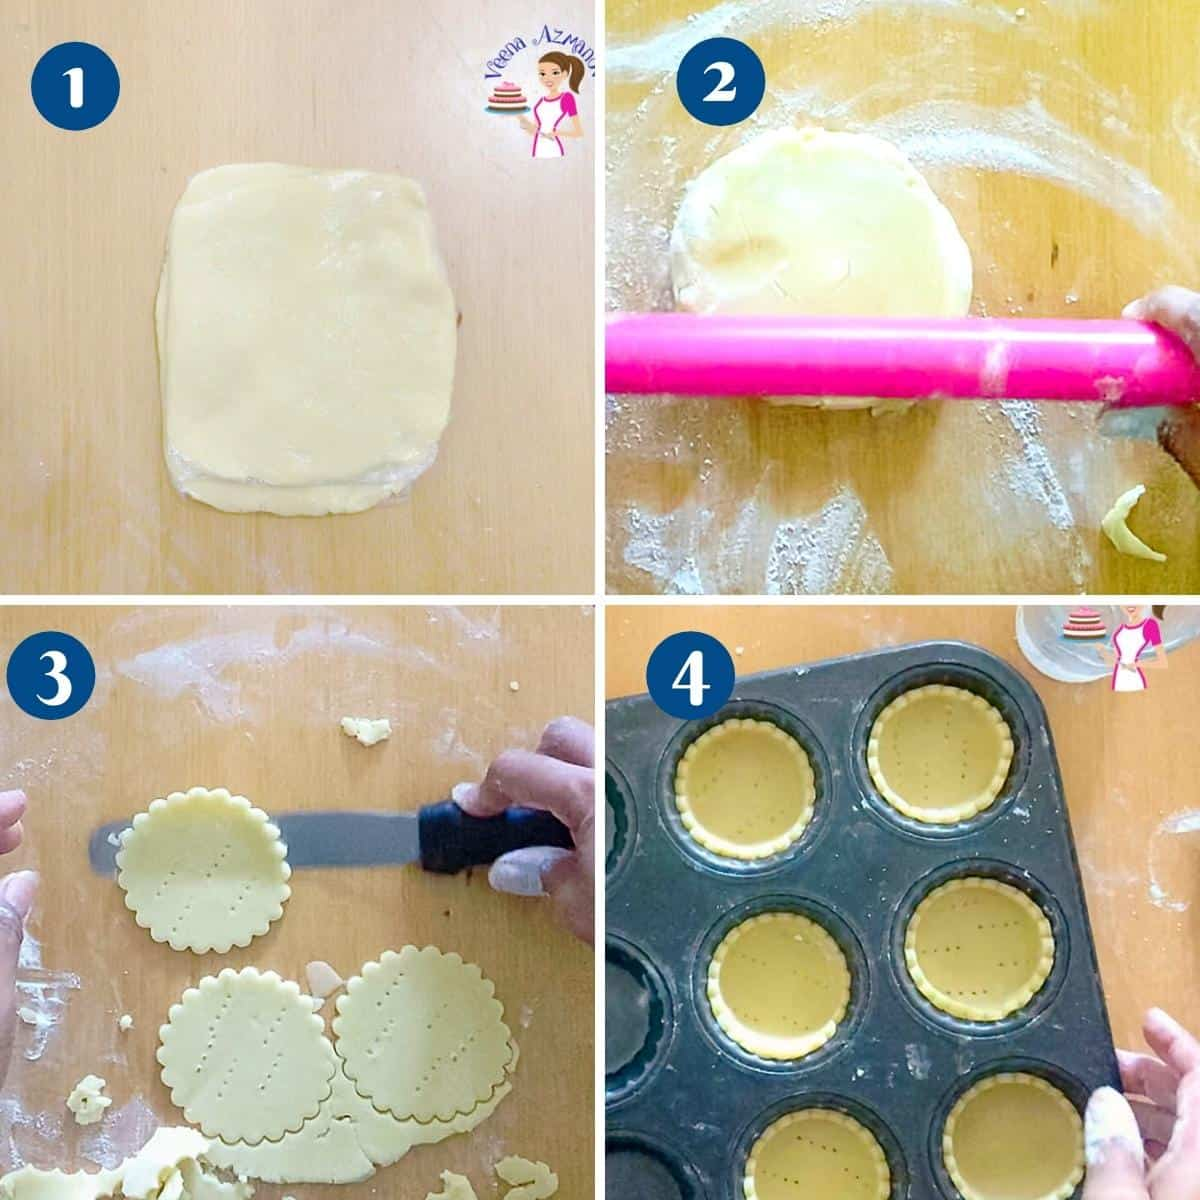 Progress pictures - Method 1 for making pastry shells mini tarts.